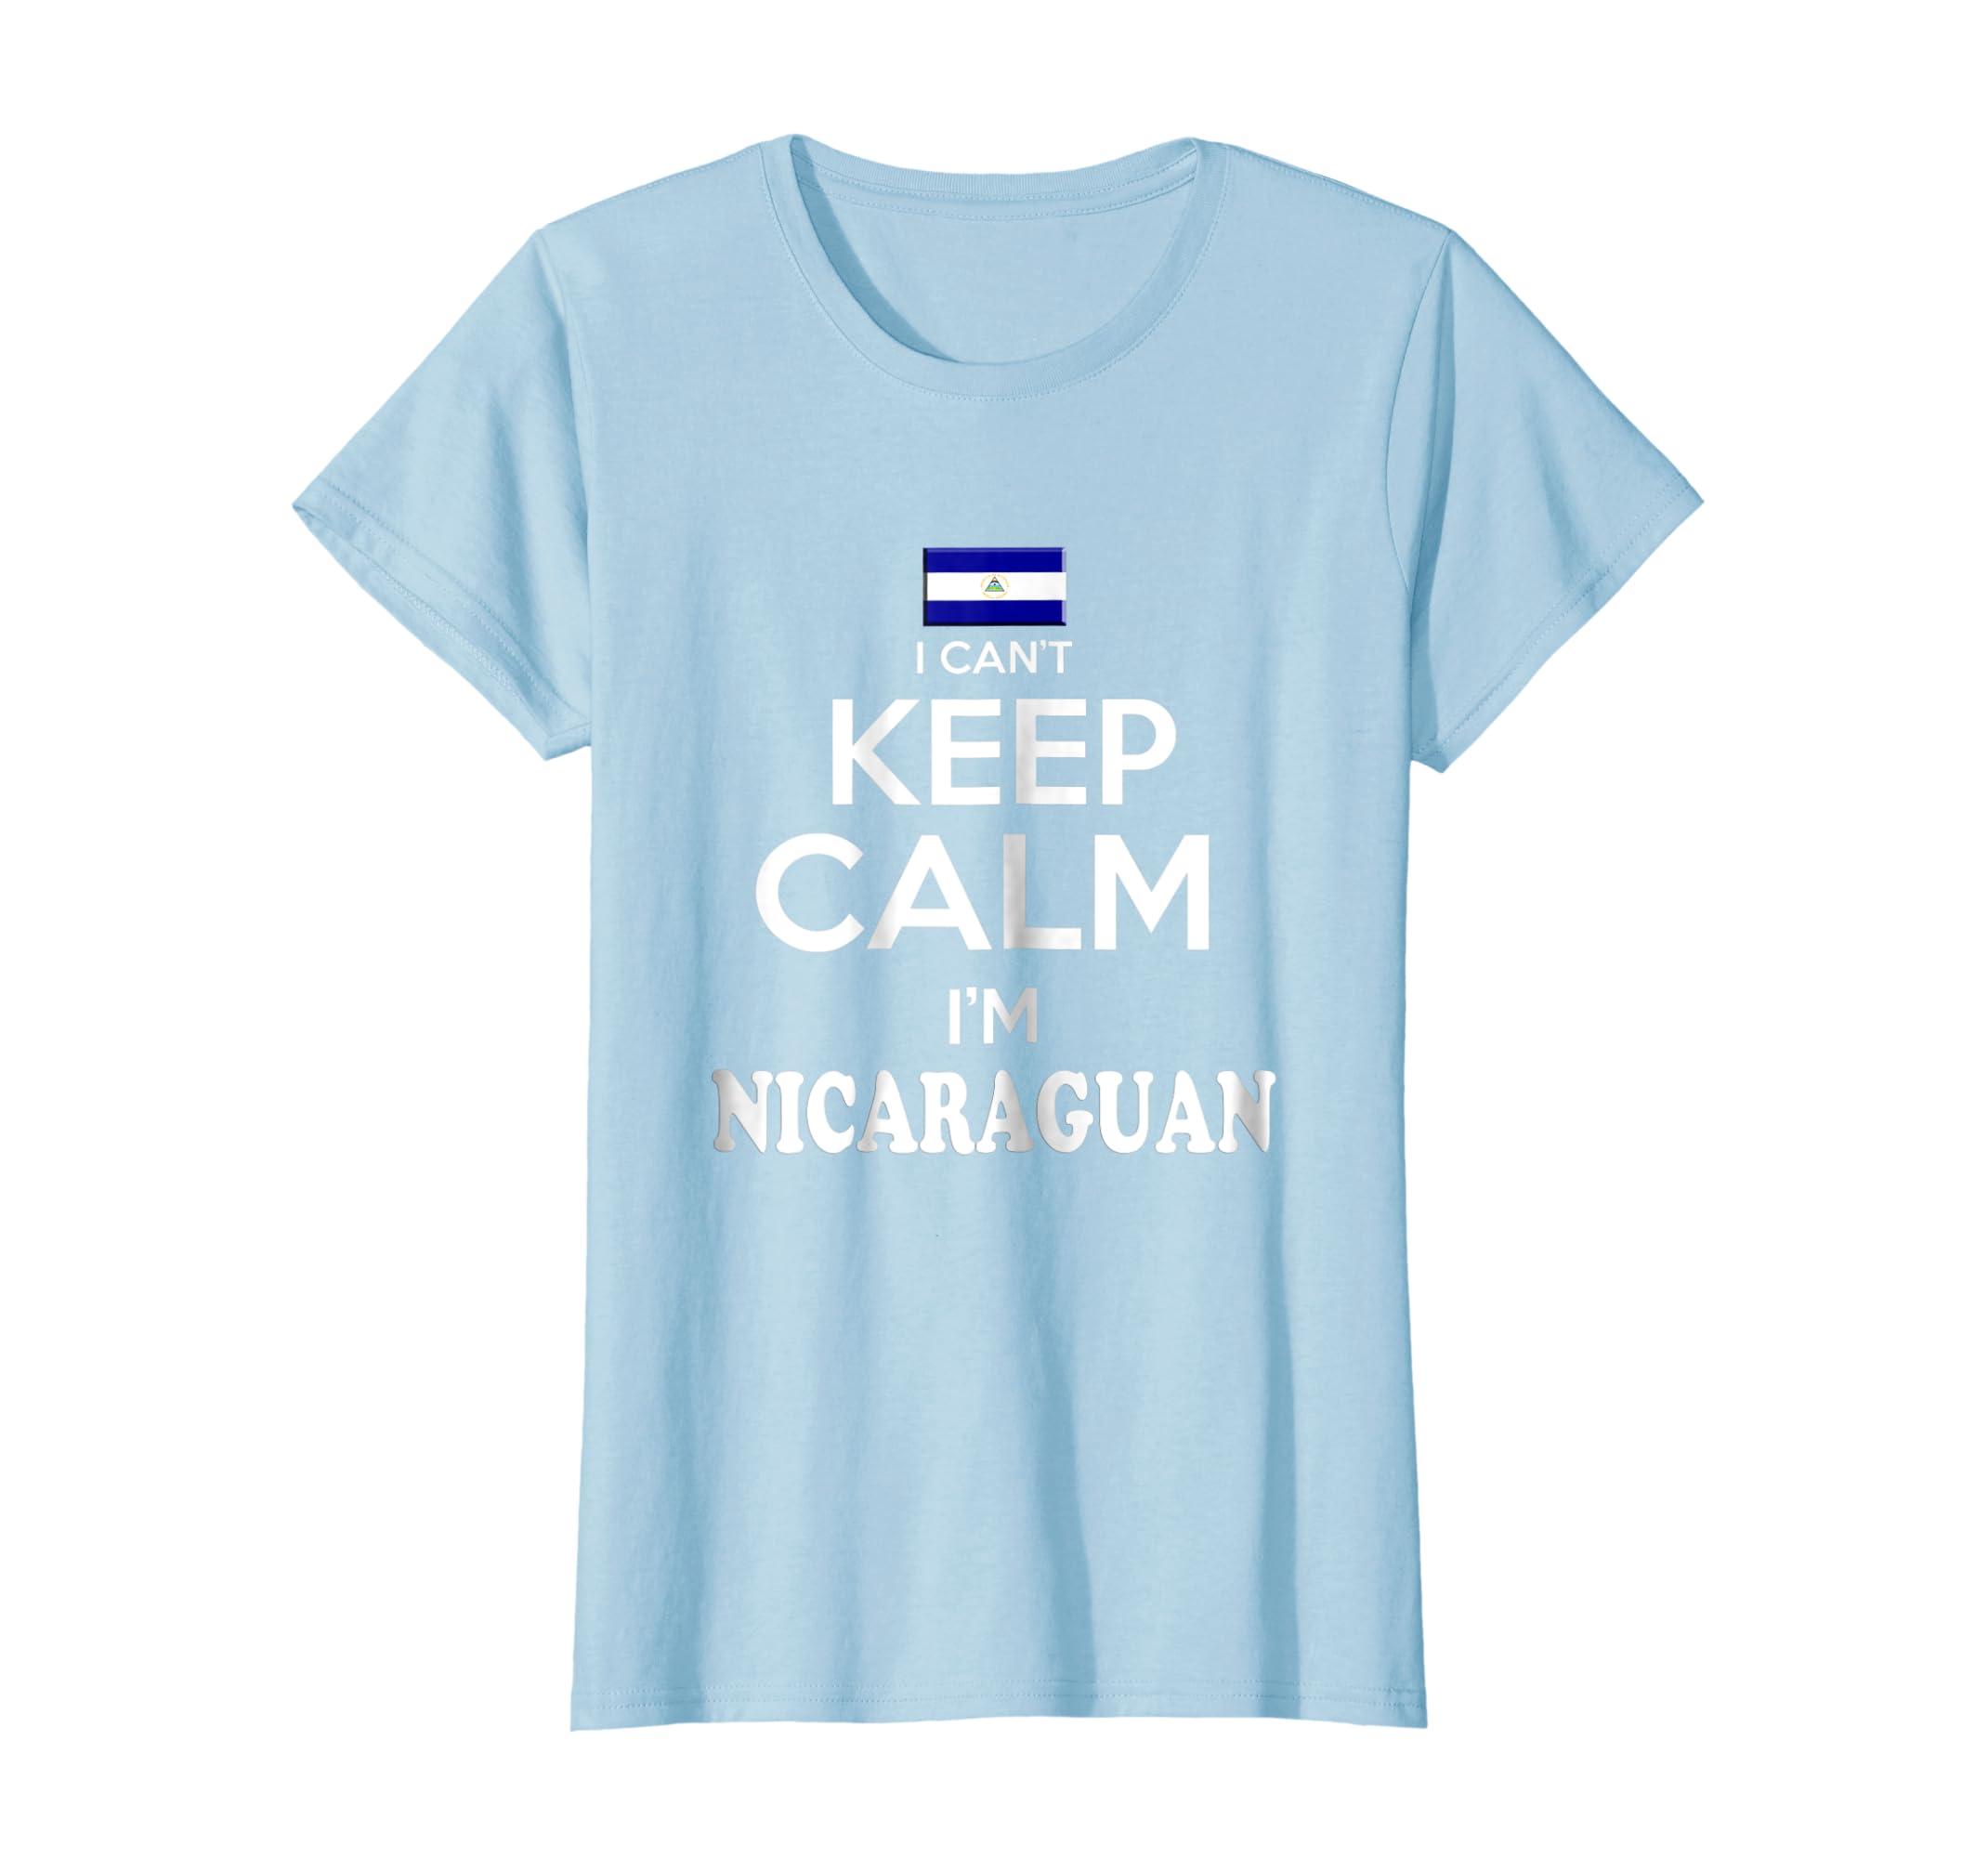 Amazon.com: Nicaragua I Cant Keep Calm Camiseta Nicaraguan Unisex tshirt: Clothing